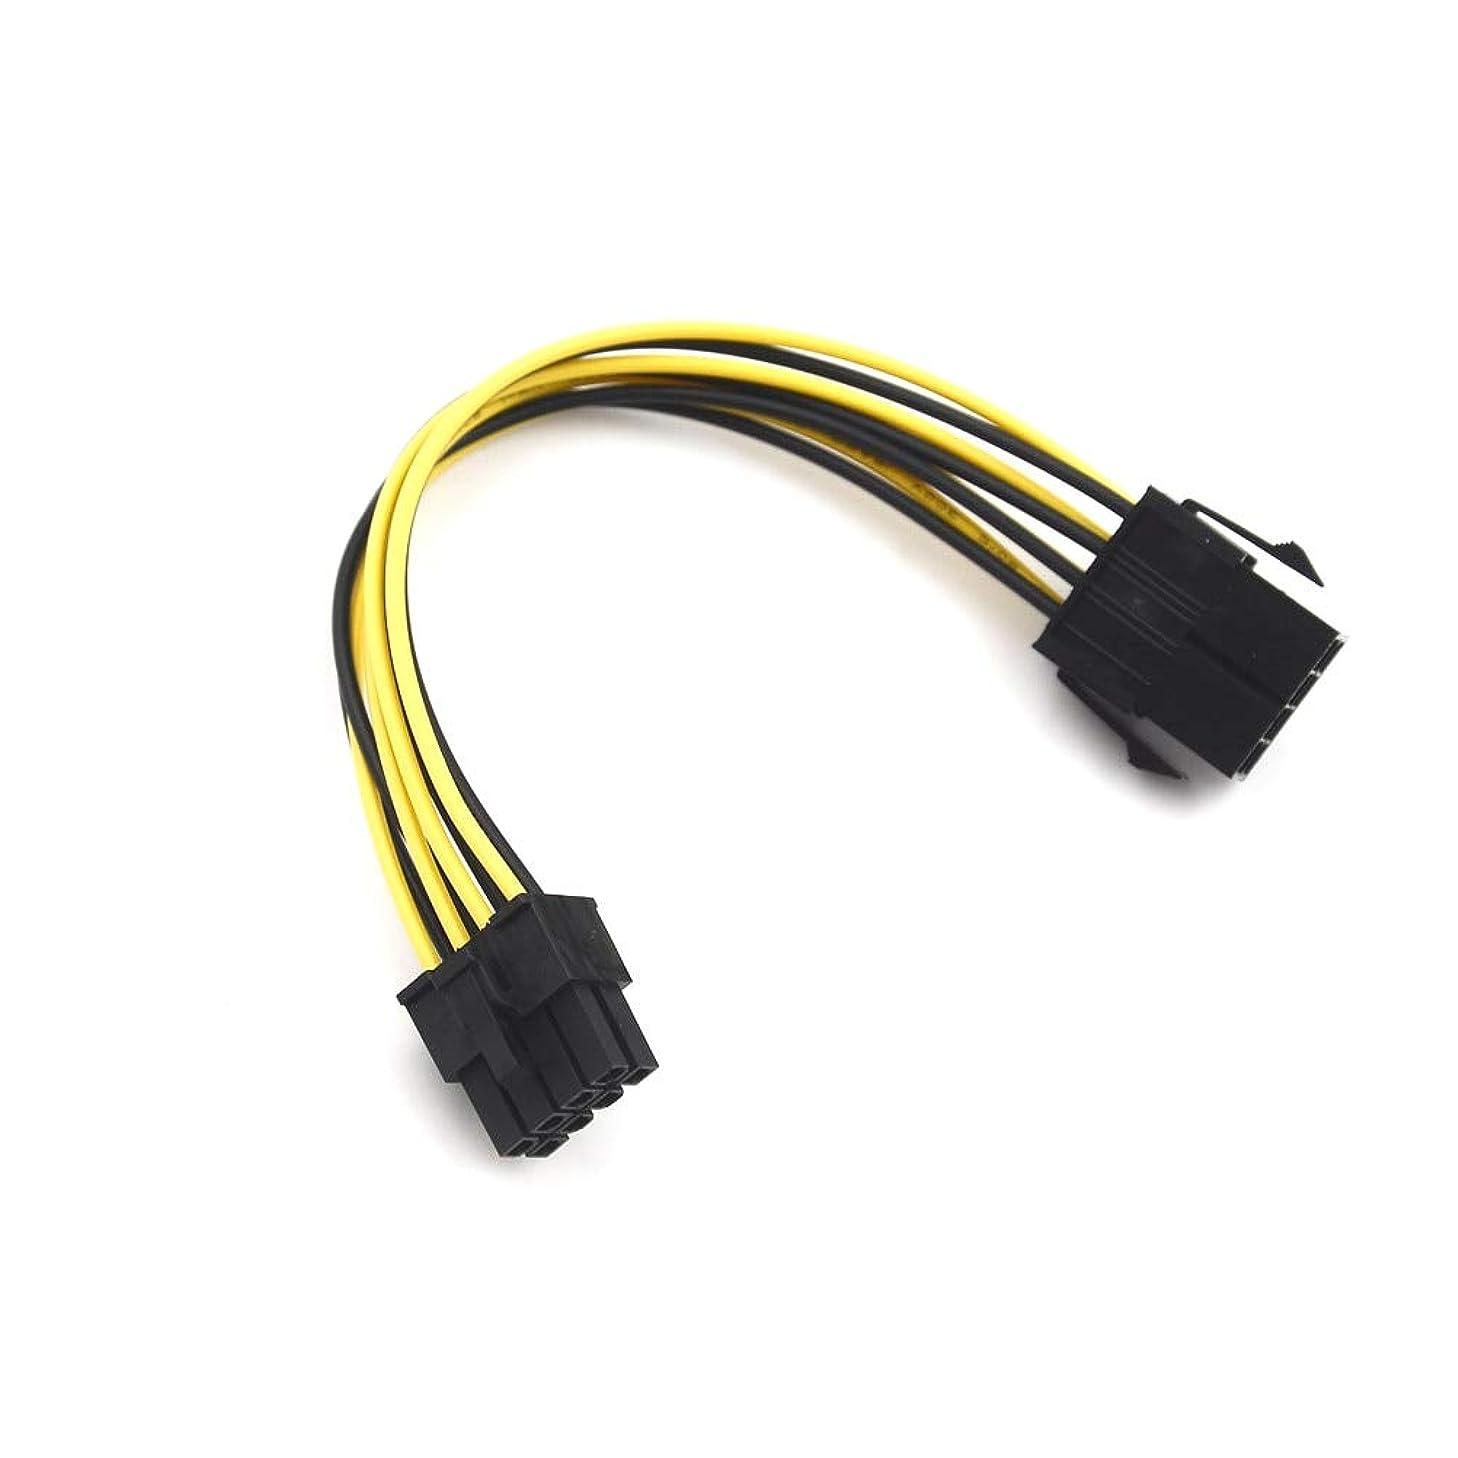 Calvas 1PCS 20cm 8 Pin ATX EPS Cables Connectors Male to Female Power Extension Computer Graphics Card